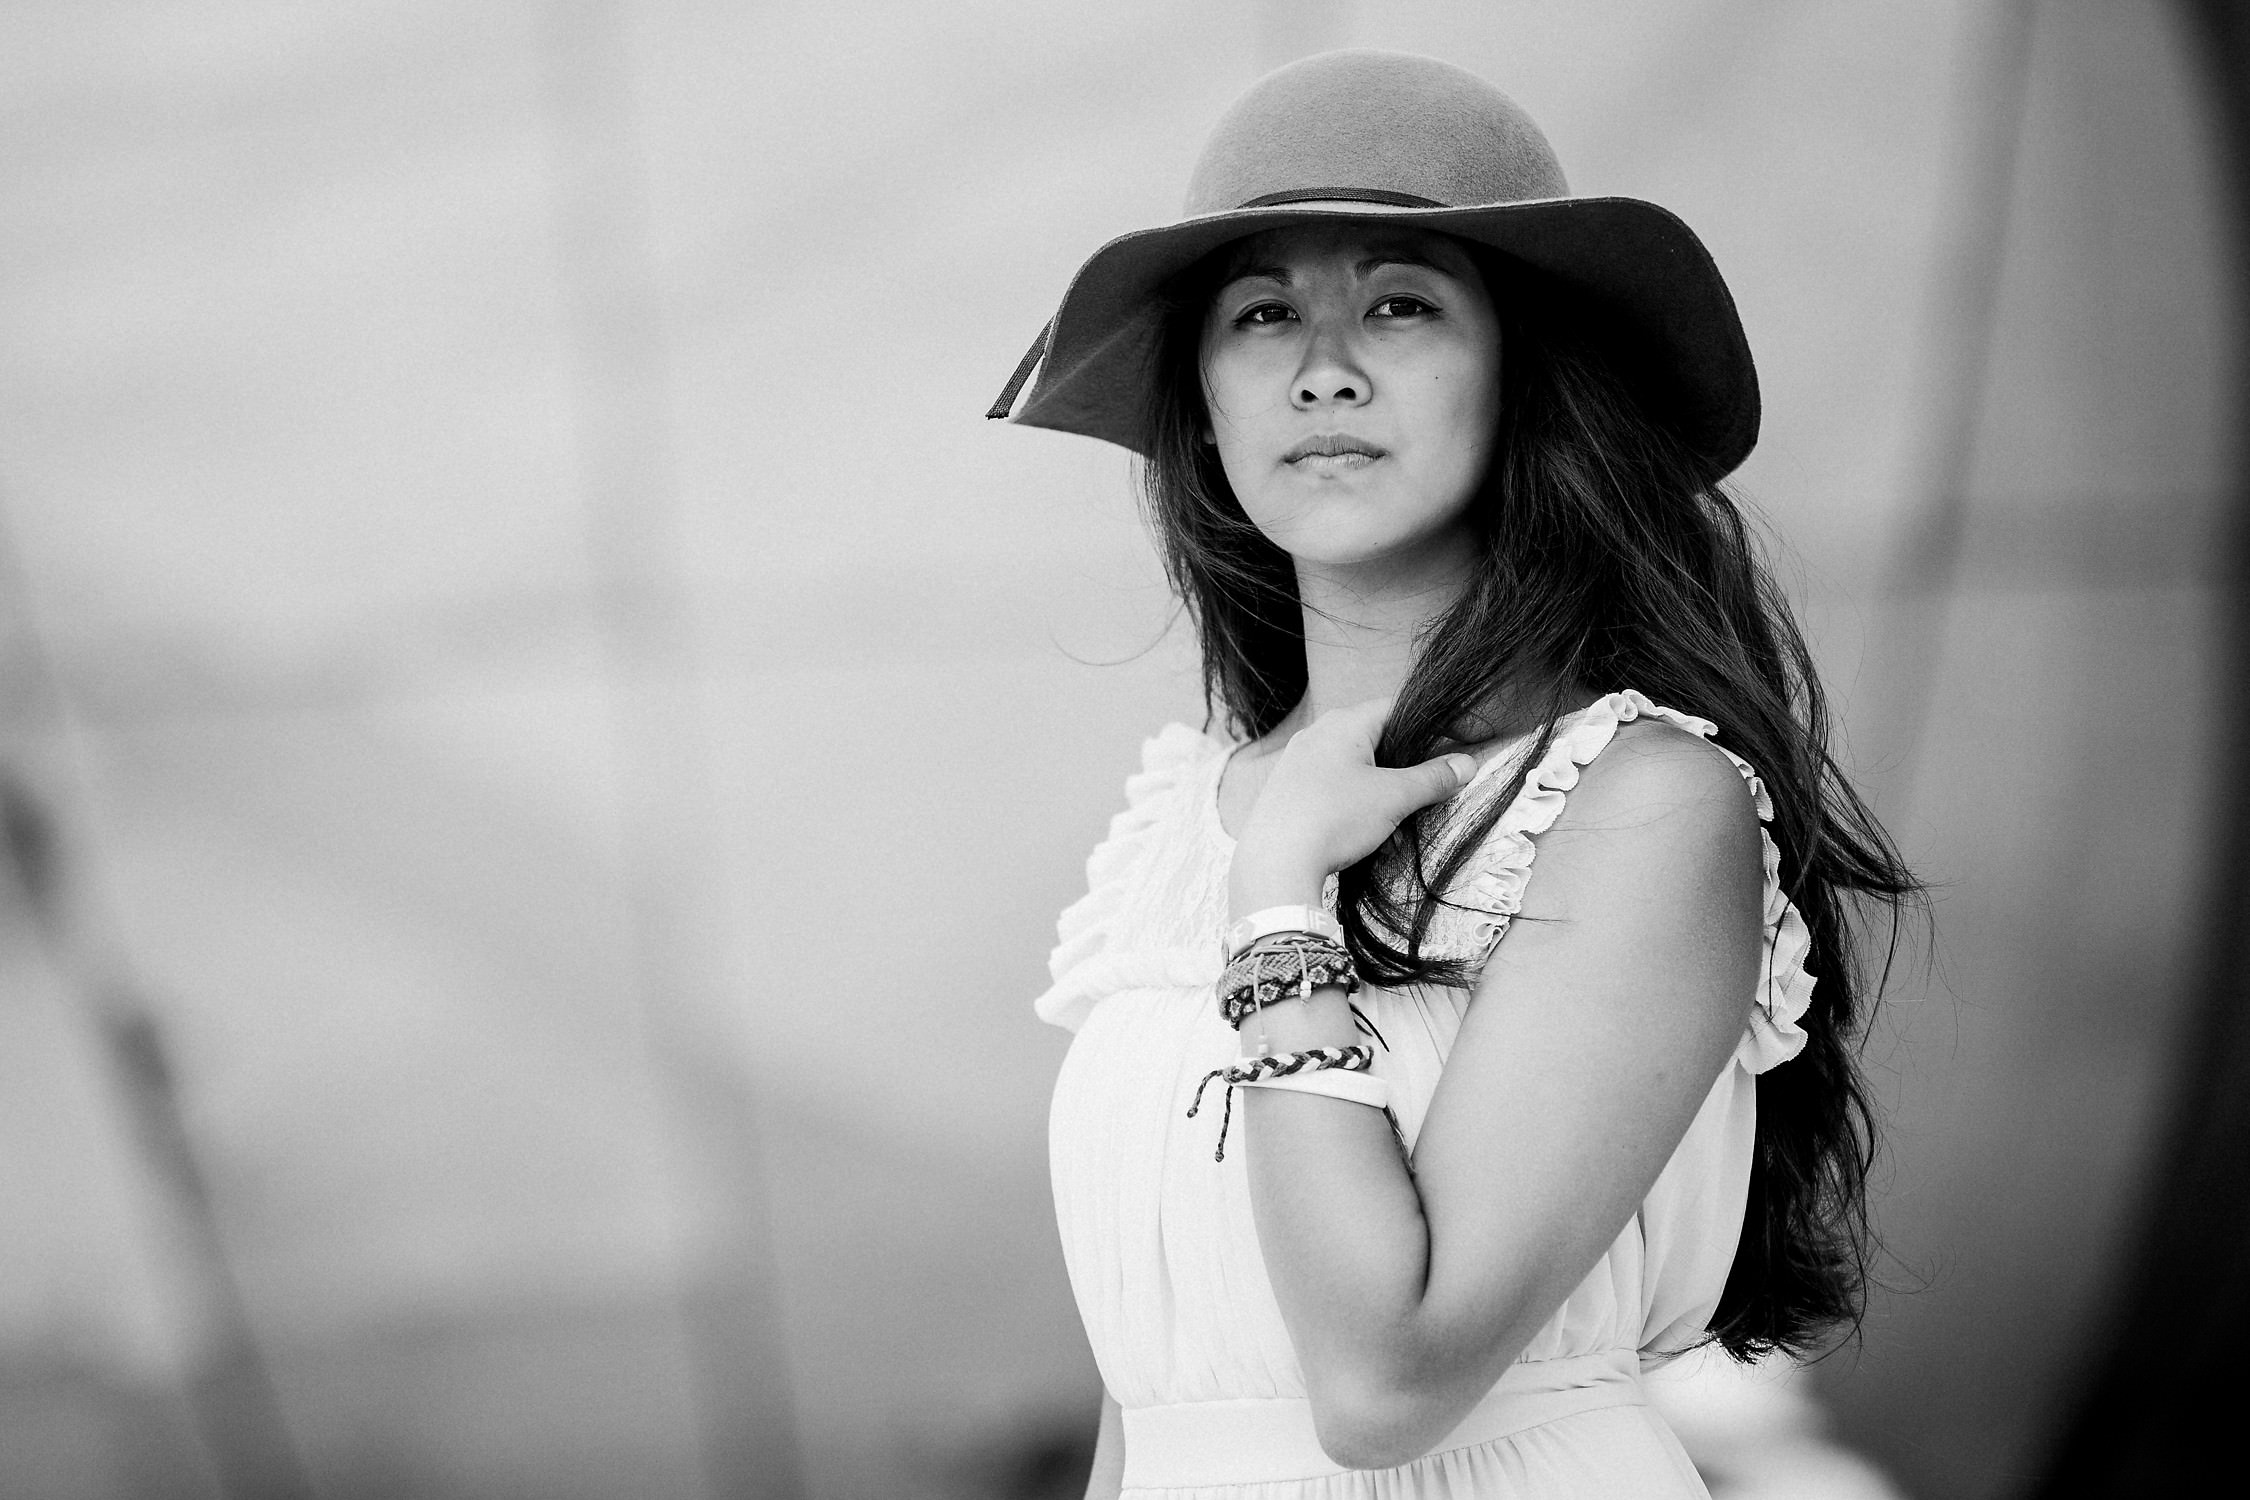 Fine-Art-Female-Portrait-Photography-1